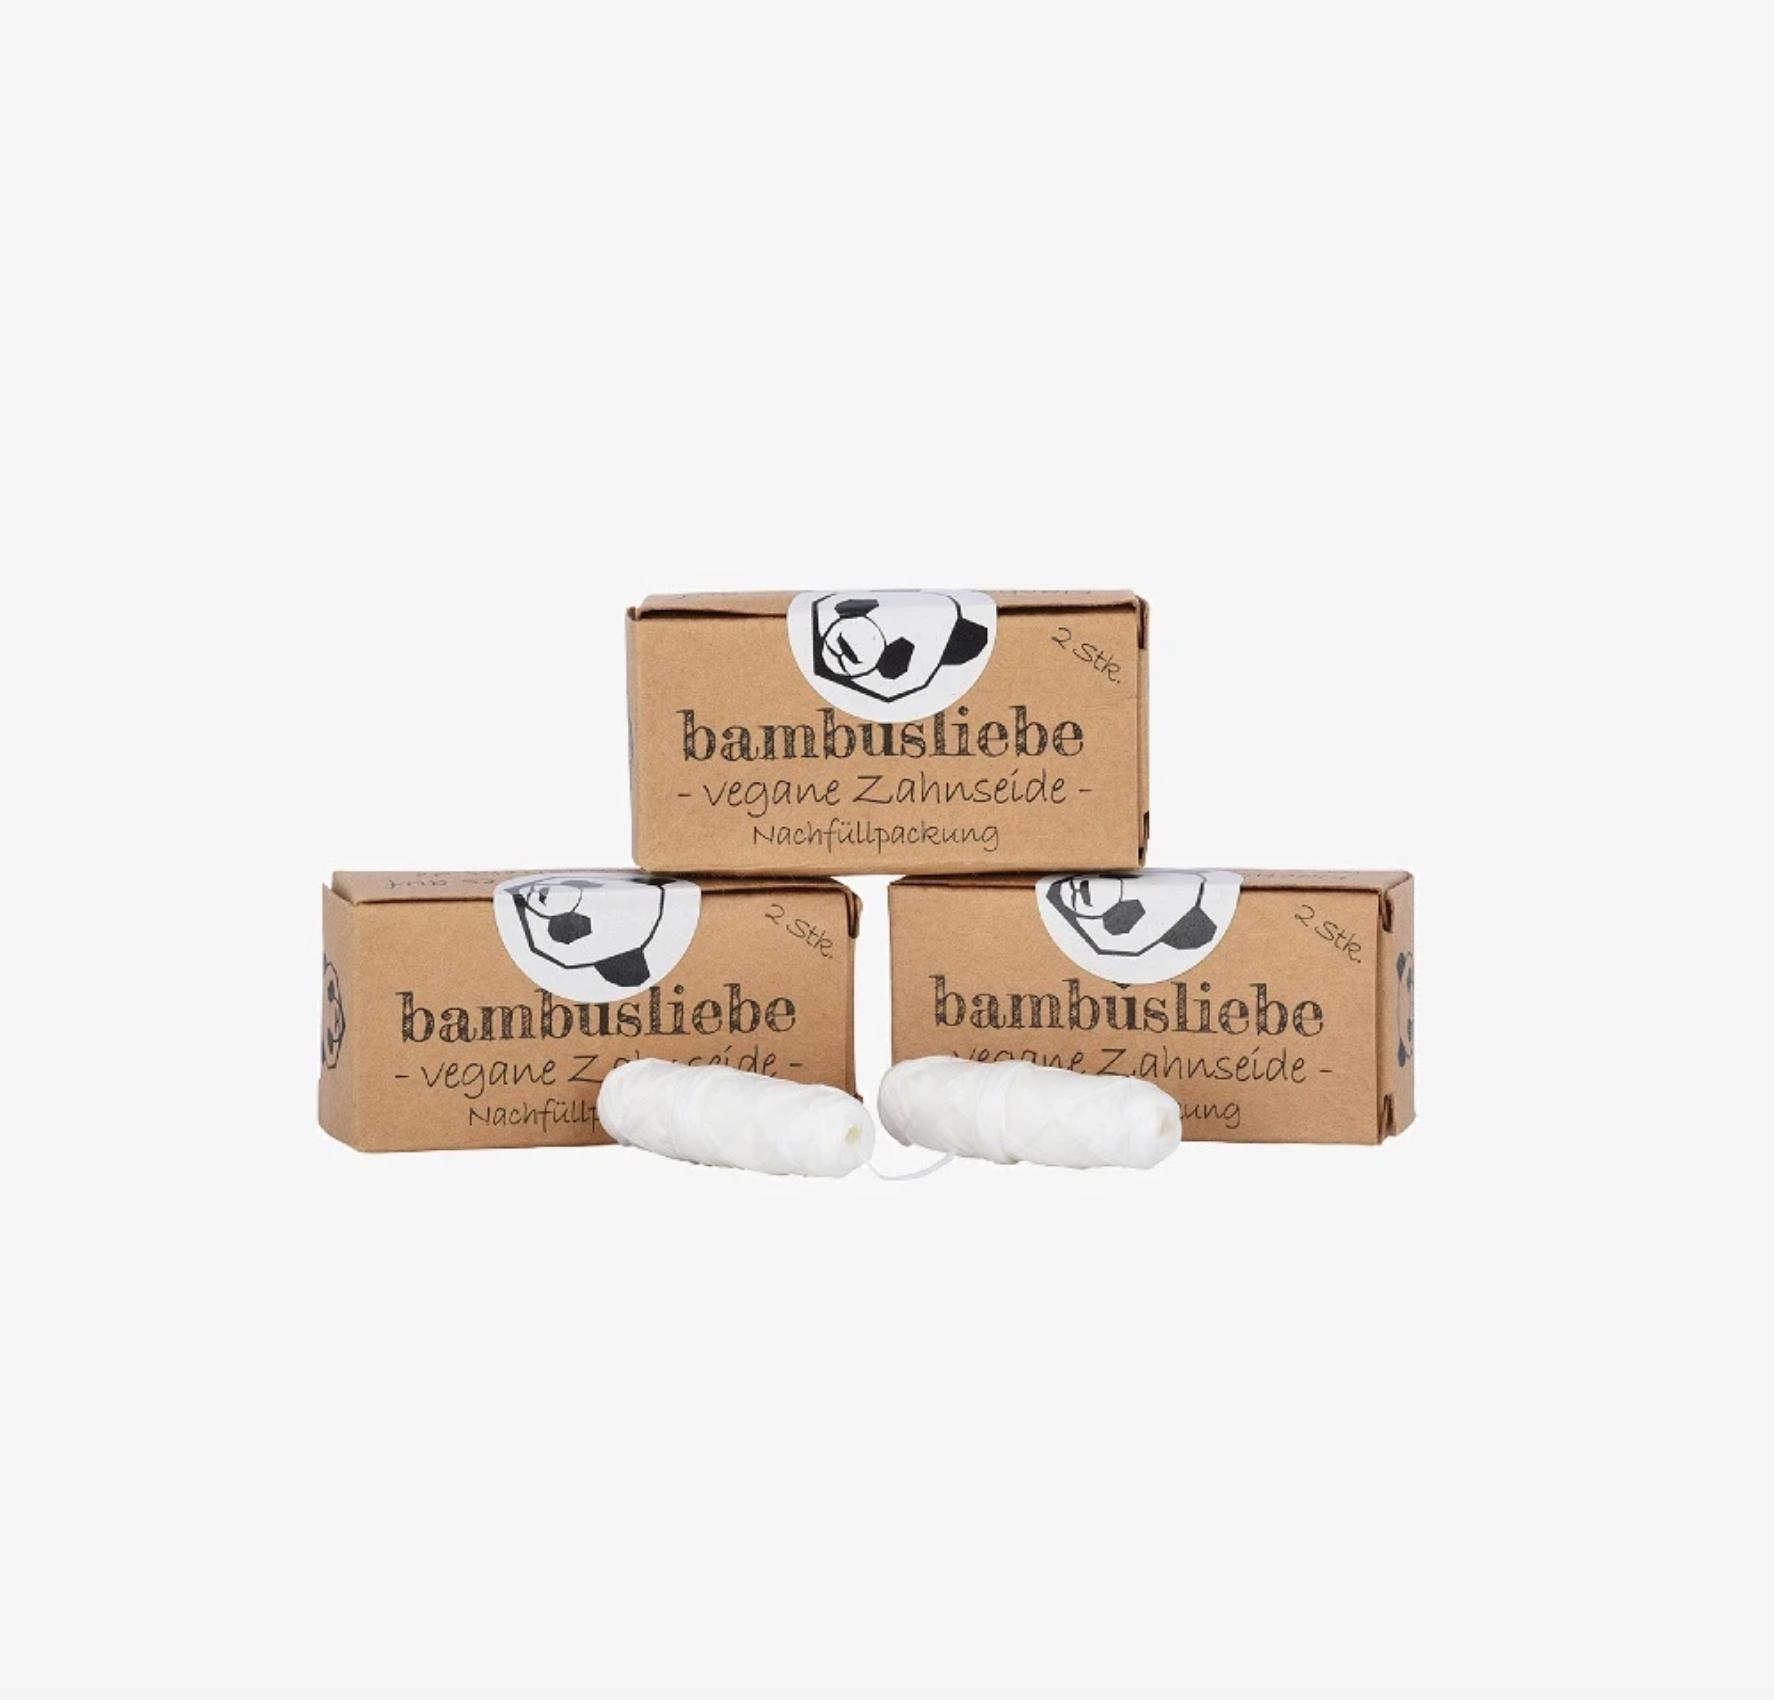 Zahnseide Nachfüllpack, vegan, Bambusliebe